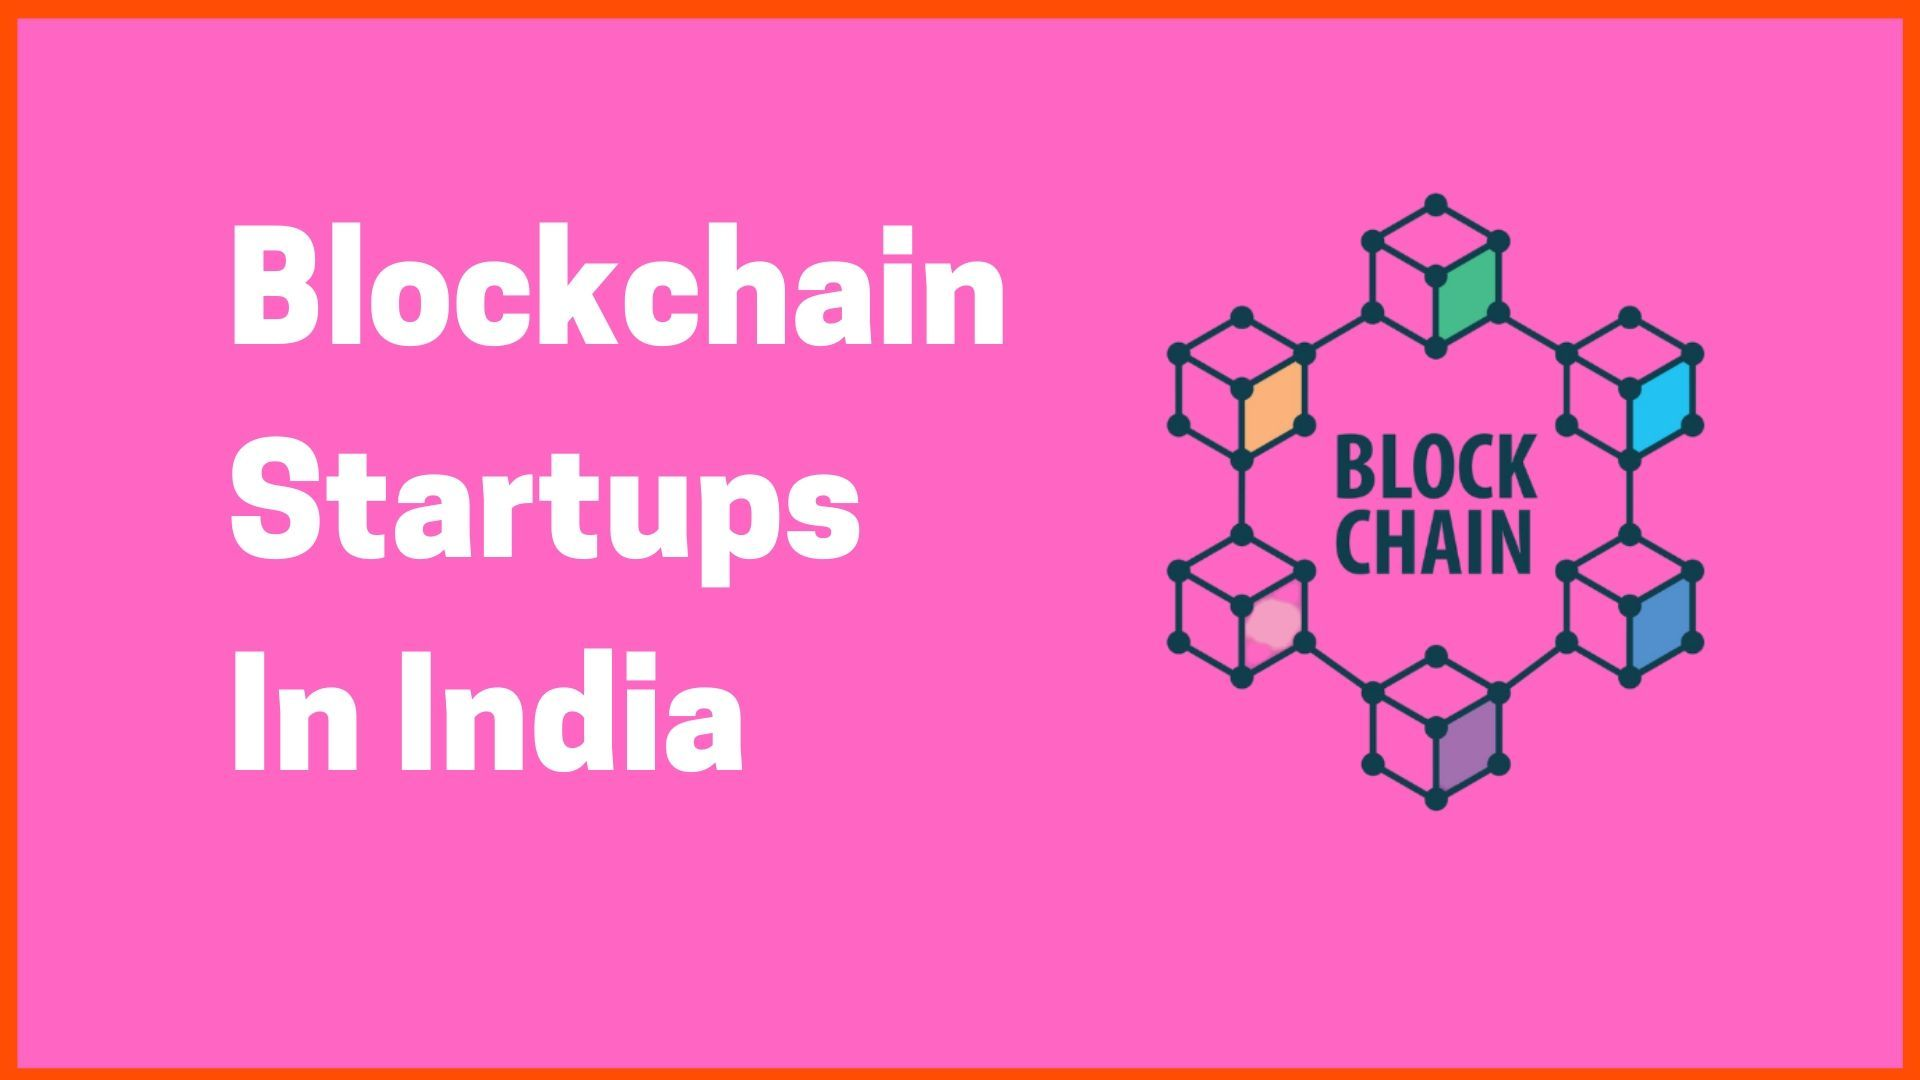 Blockchain Startups In India